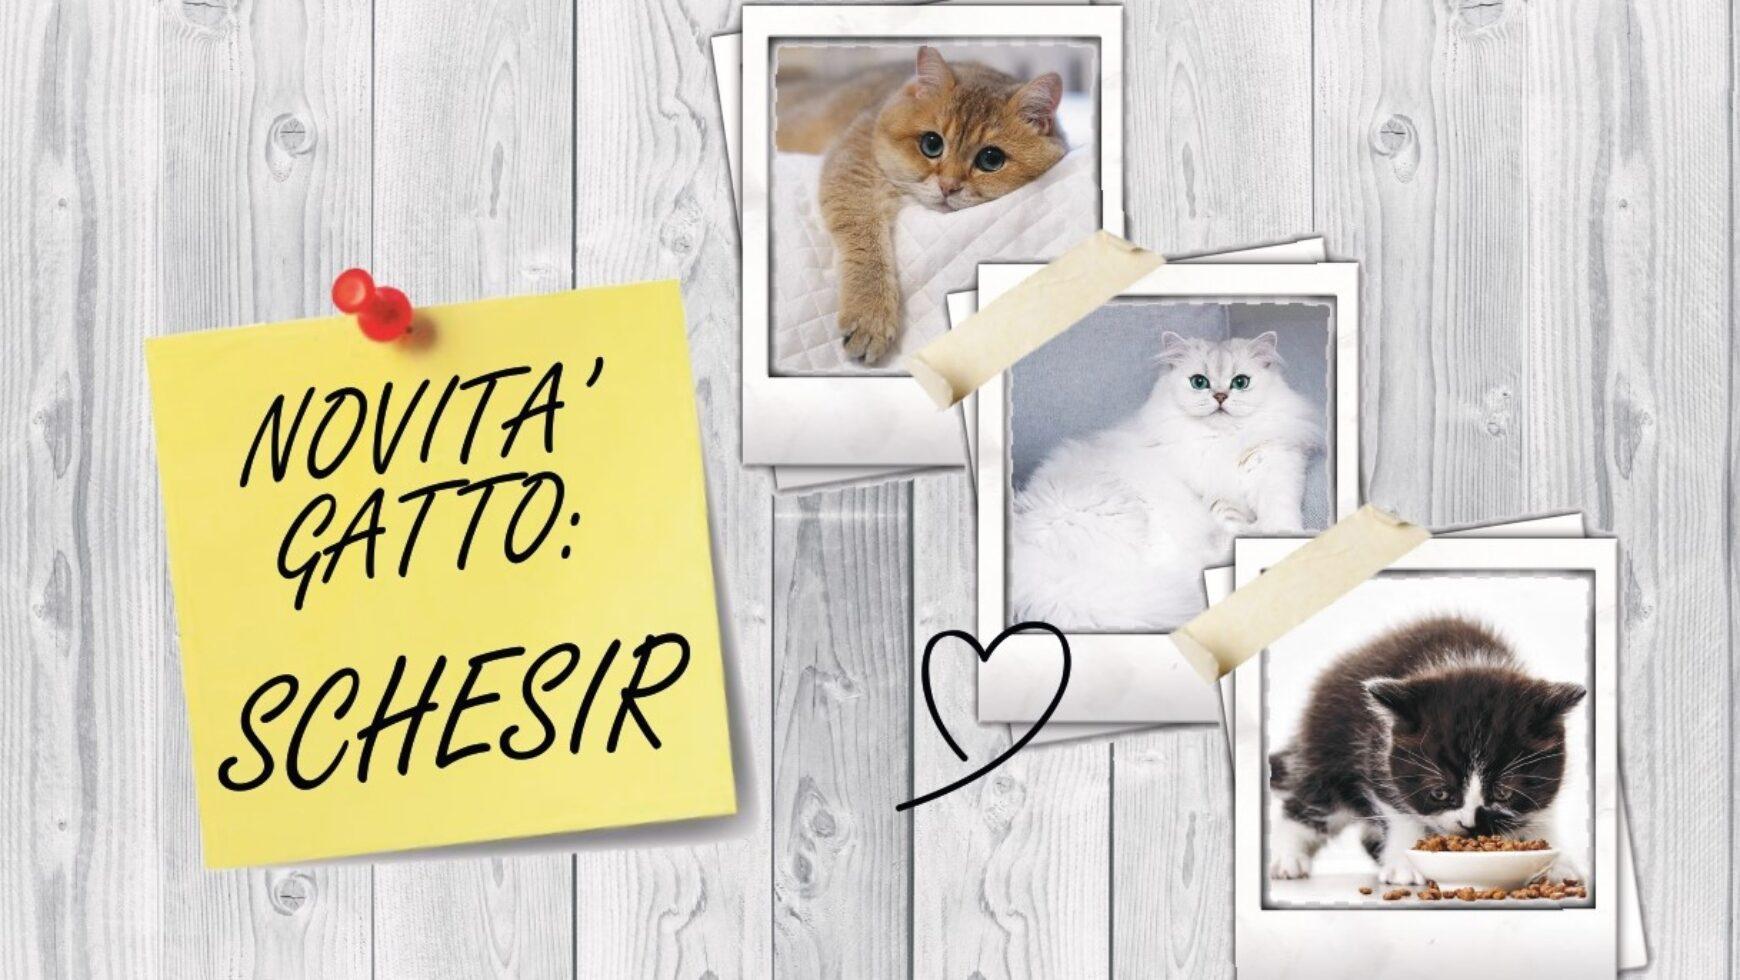 GRANDE NOVITA': LINEA GATTO SCHESIR!